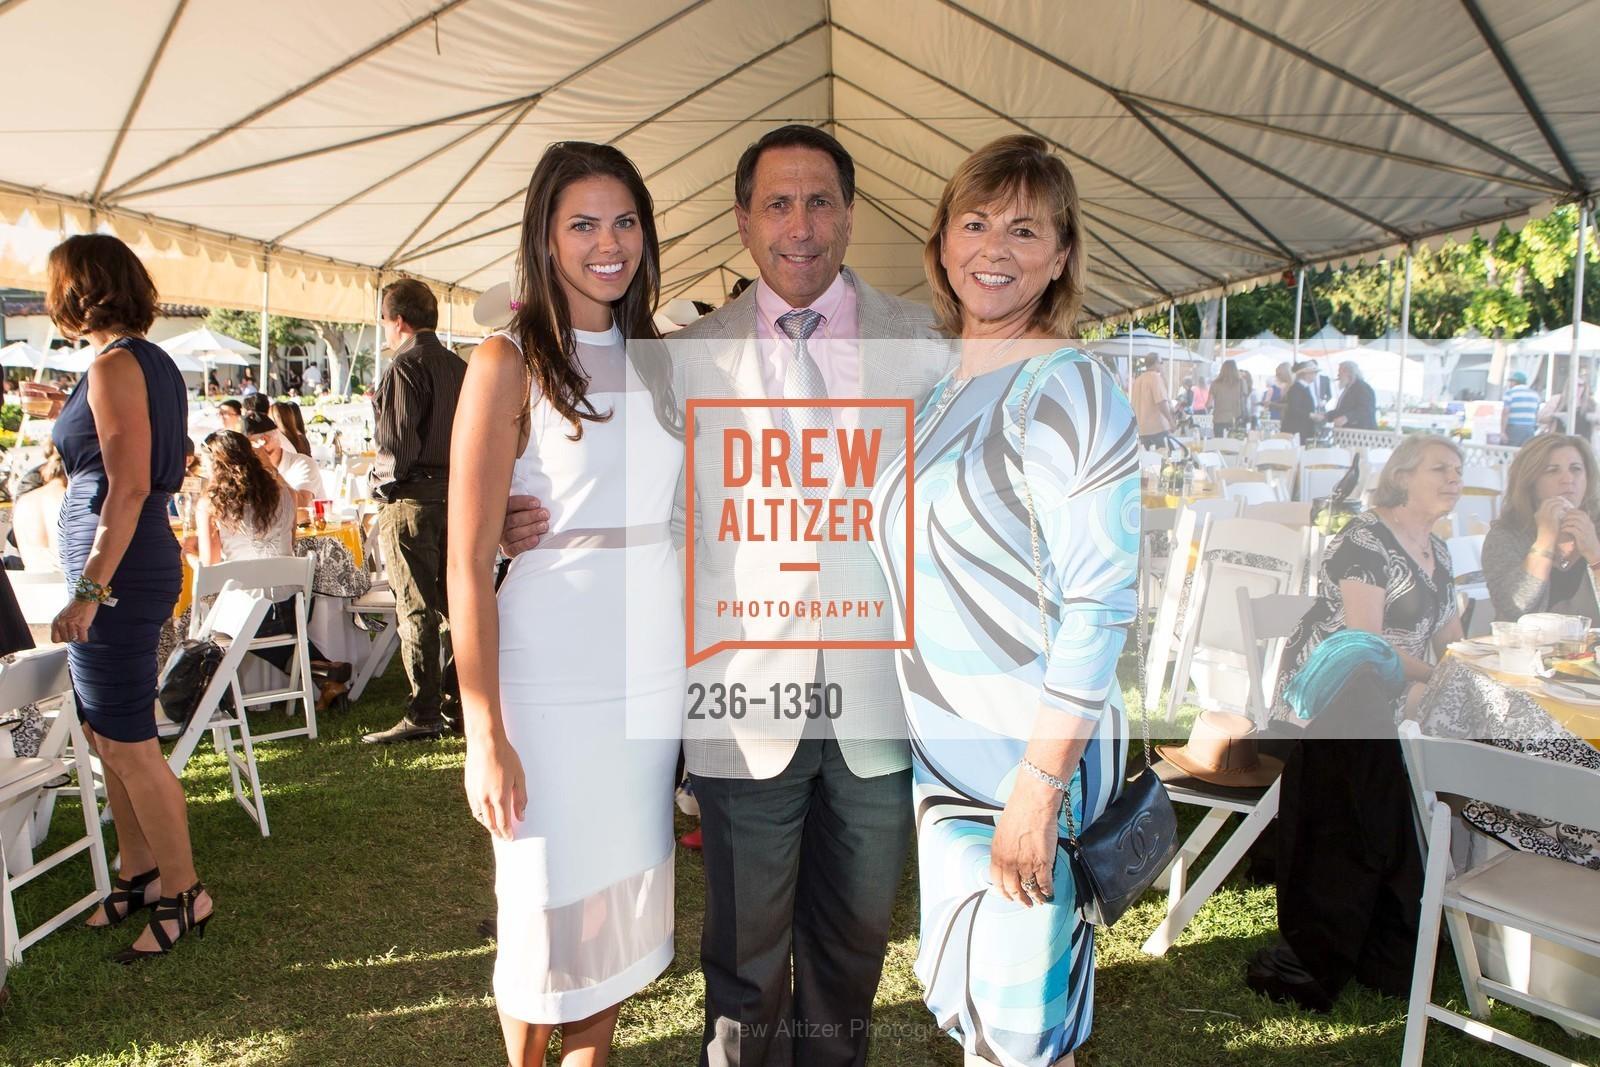 Kristen Hiller, Jeff Hiller, Mary Hiller, Photo #236-1350